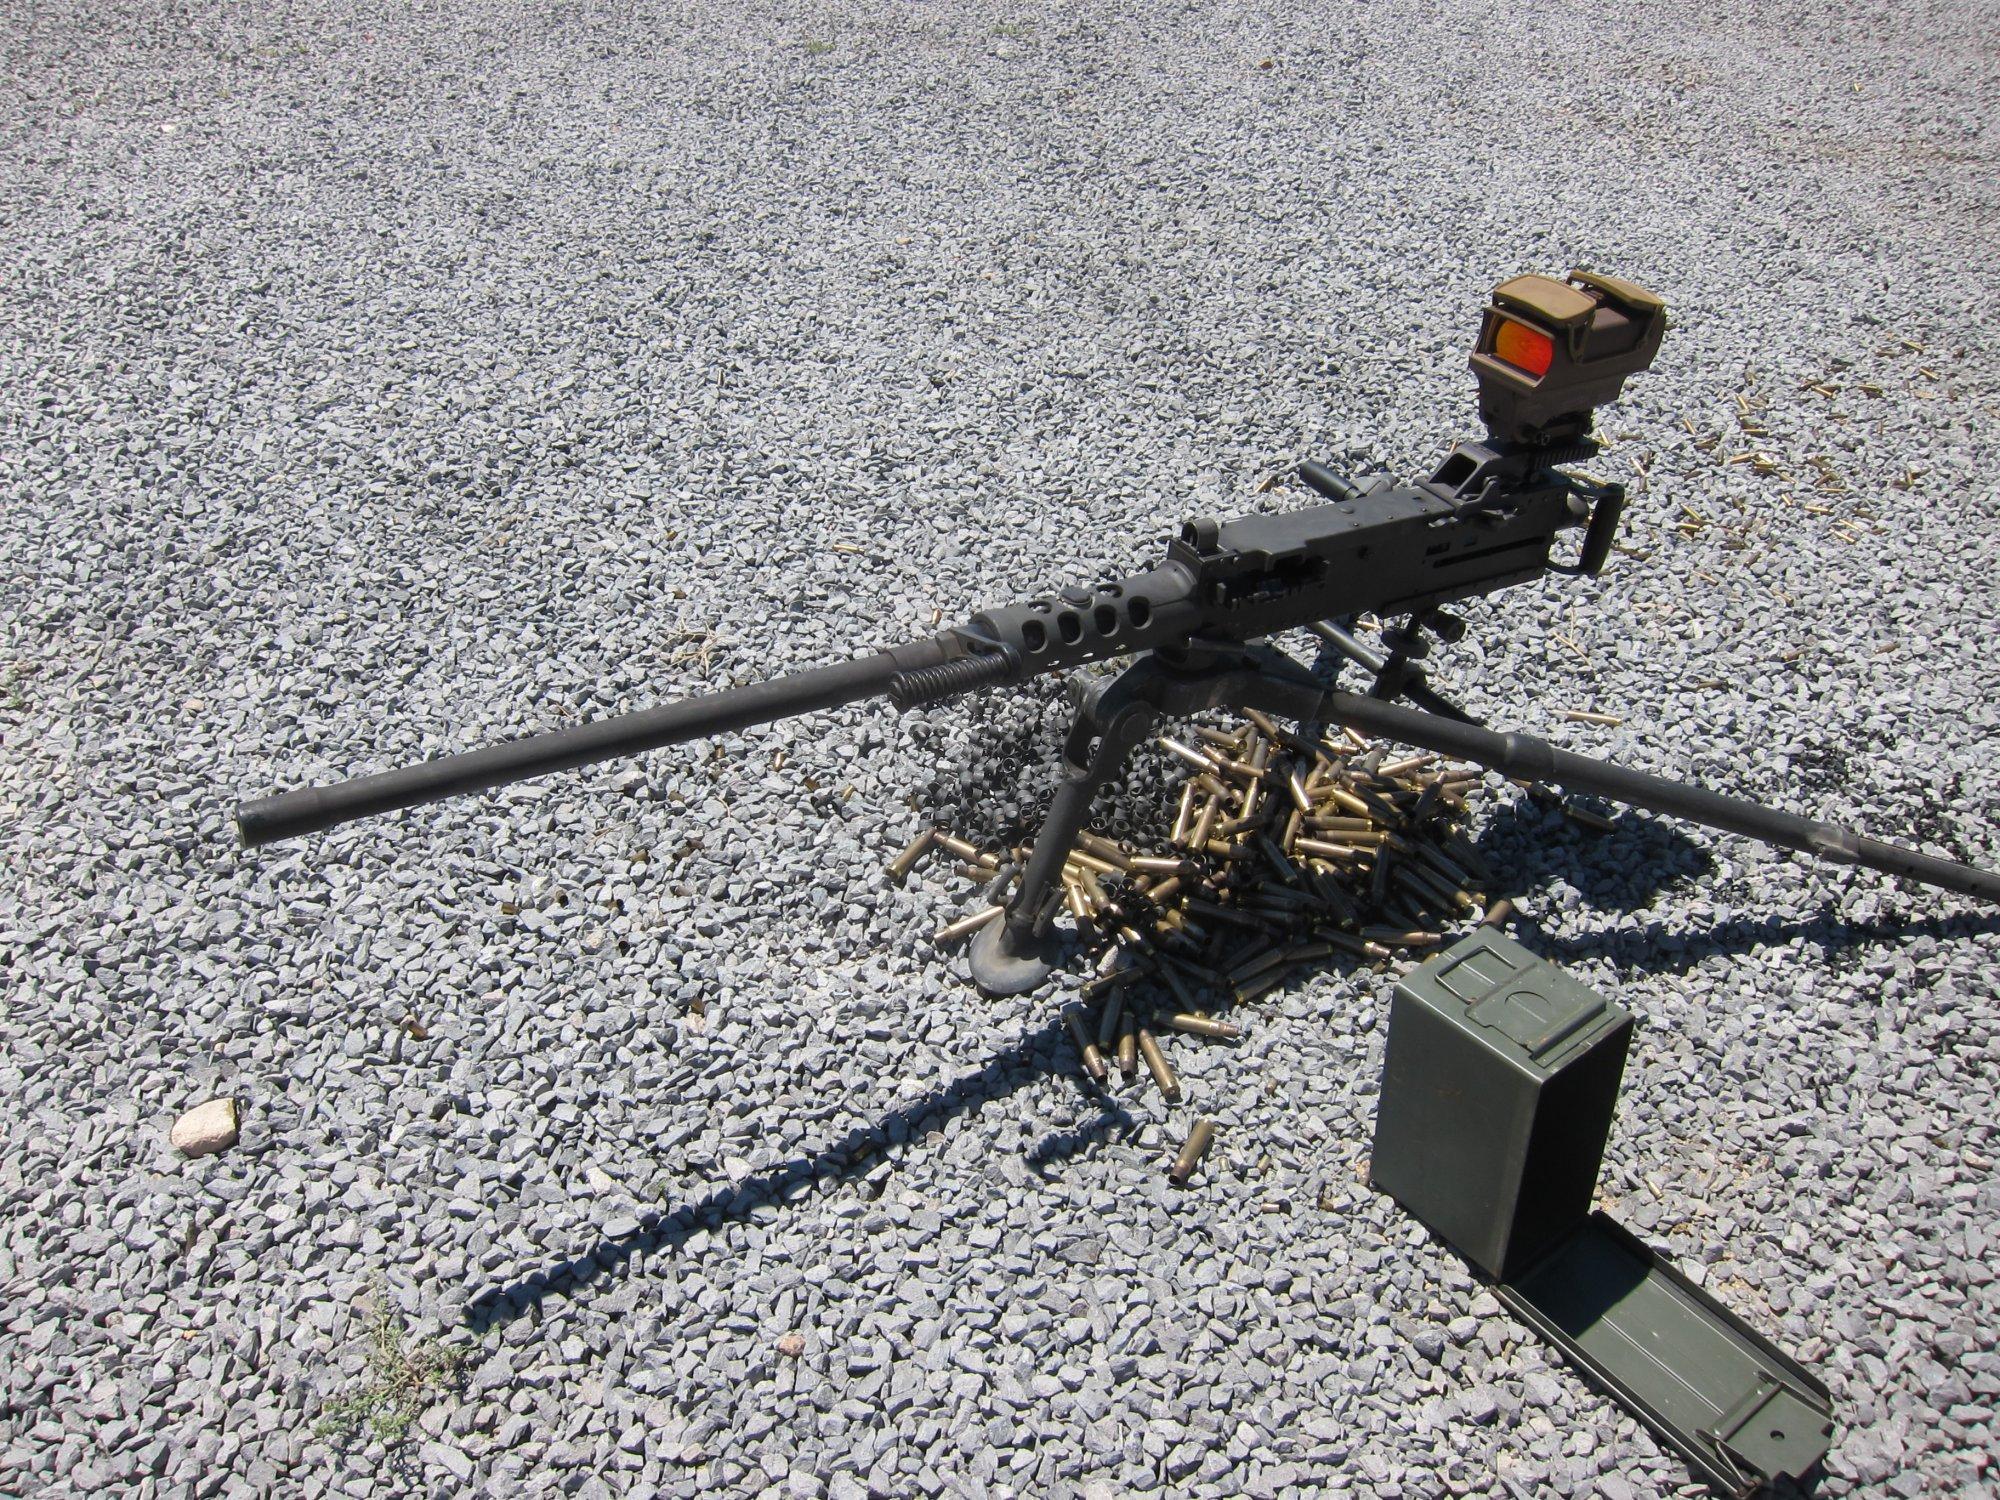 U.S. Ordnance M2HB QCB .50 BMG Heavy Machine Gun HMG David Crane Firing at Range DefenseReview.com DR 5 <!  :en  >U.S. Ordnance M2HB QCB (Quick Change Barrel) Ma Deuce .50 BMG Heavy Machine Gun (HMG) Equipped with Raytheon ELCAN SpecterHR Wide View Dual Red Dot Optical Gunsight Gets Test Fired at the Range (Video!)<!  :  >